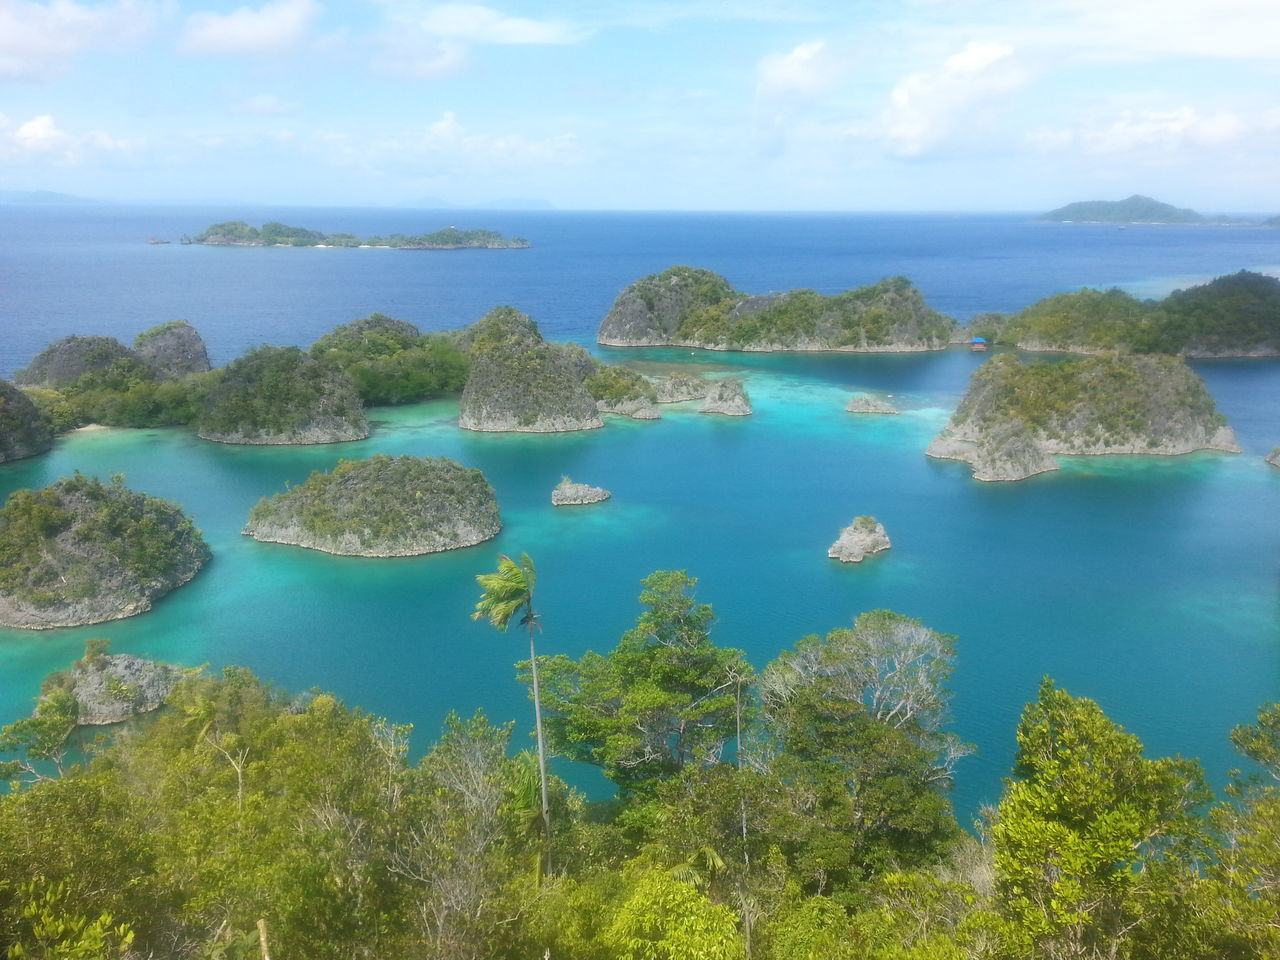 Nofilter#noedit Rajaampat Waiwodiverajaampat.com Waiwo Waisai INDONESIA Indonesia_photography Mobile Photography